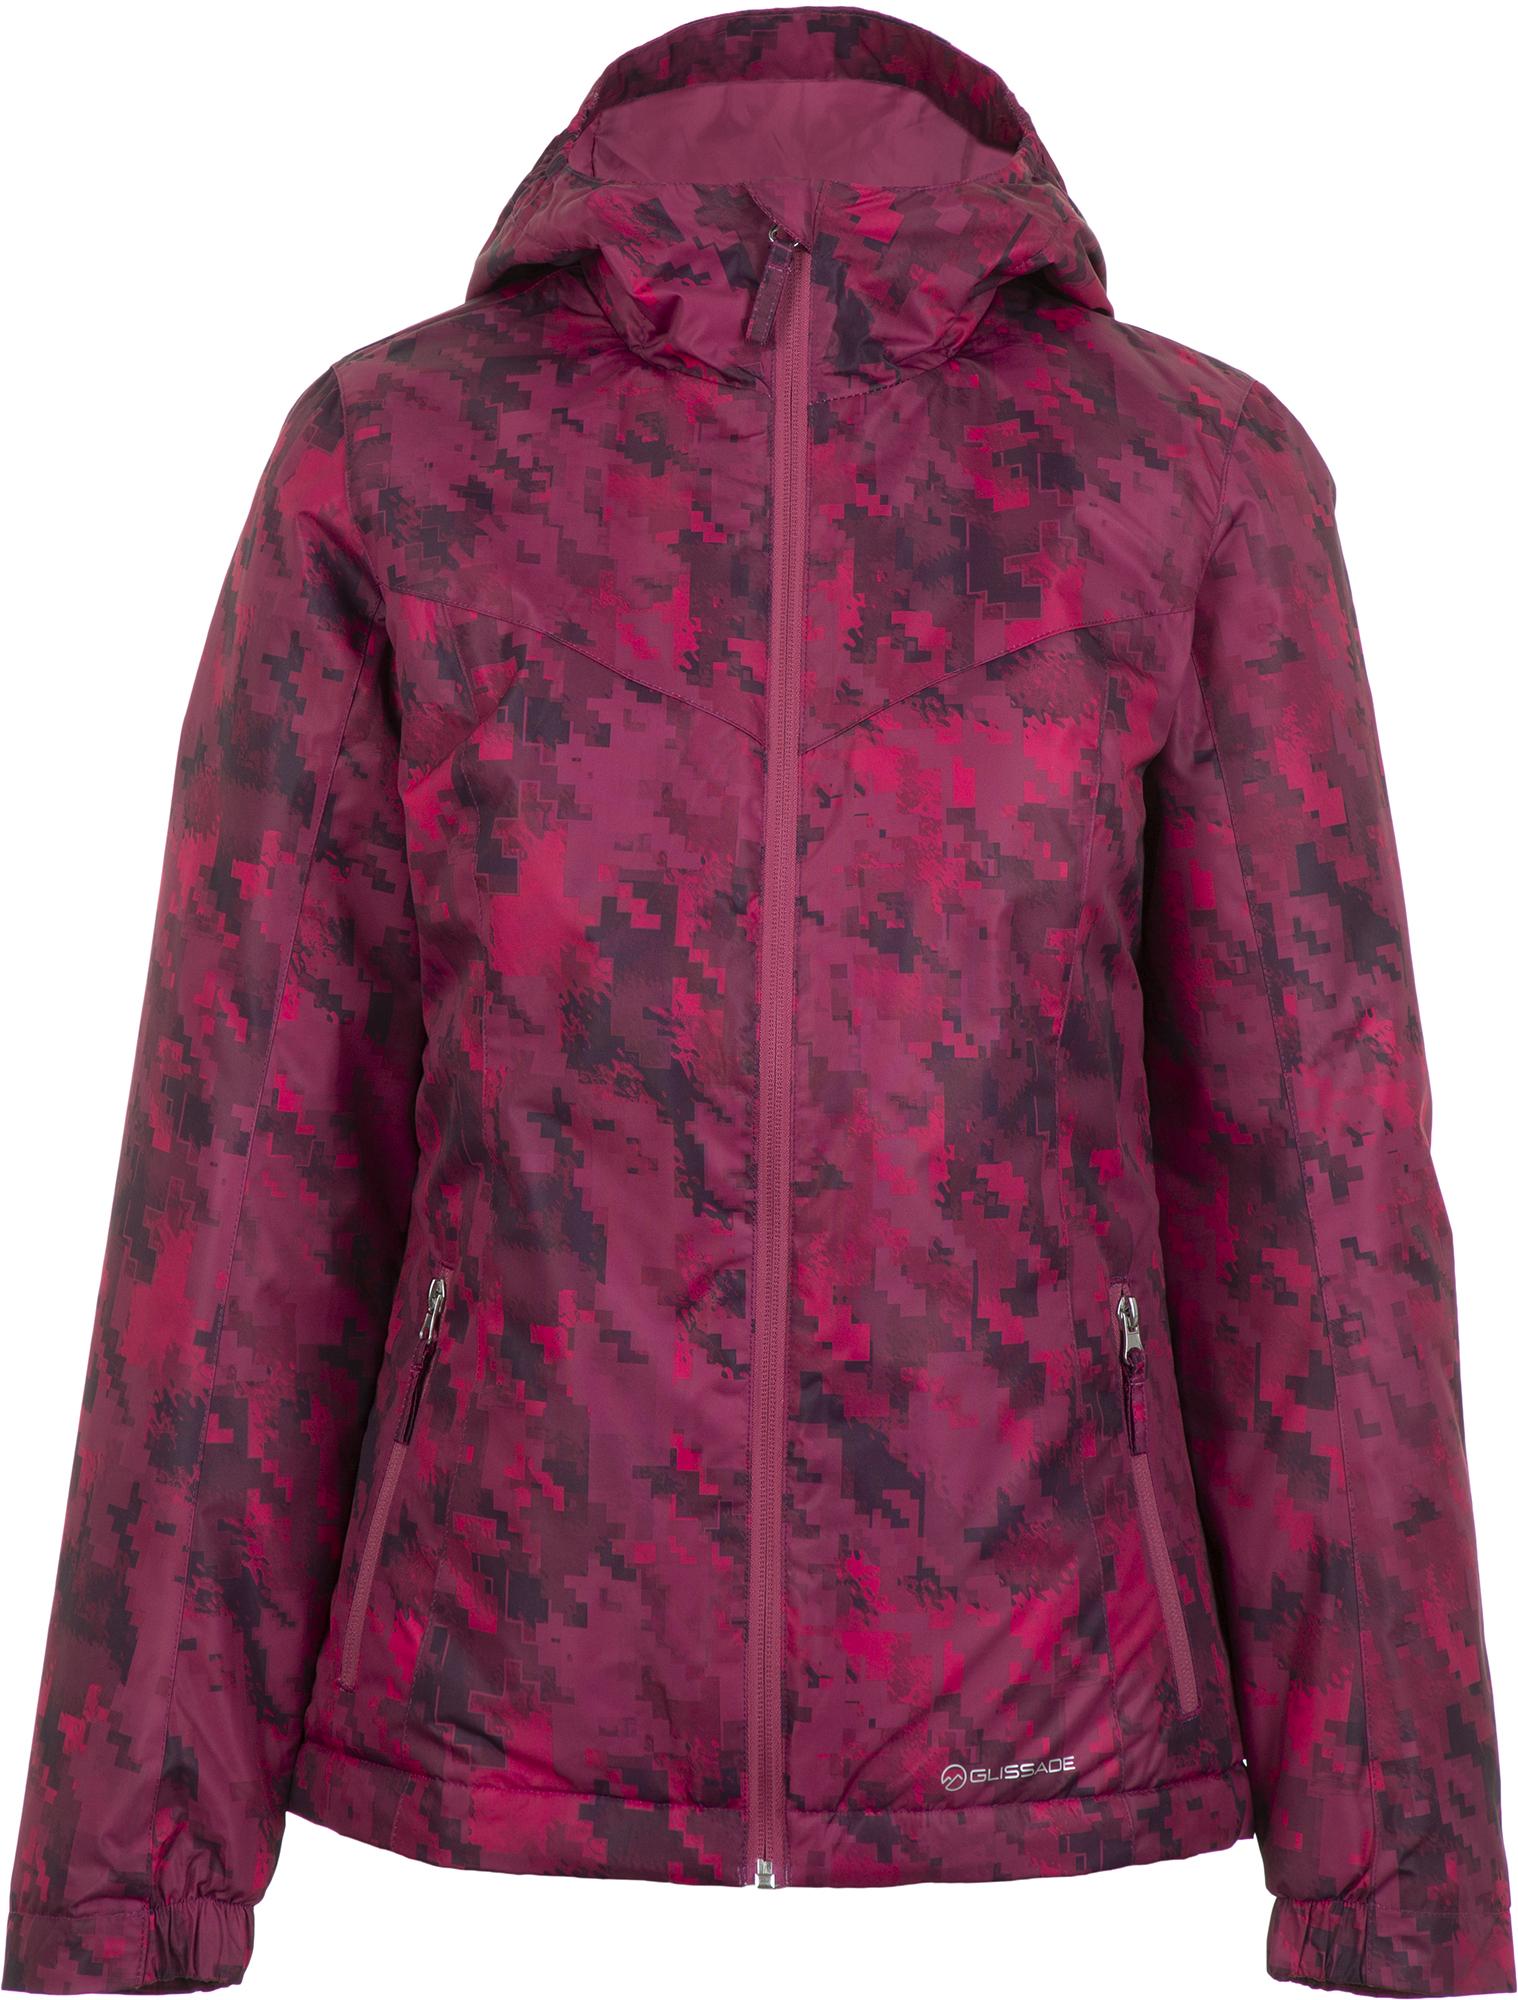 Glissade Куртка утепленная женская Glissade, размер 44 glissade куртка утепленная мужская glissade размер 56 58